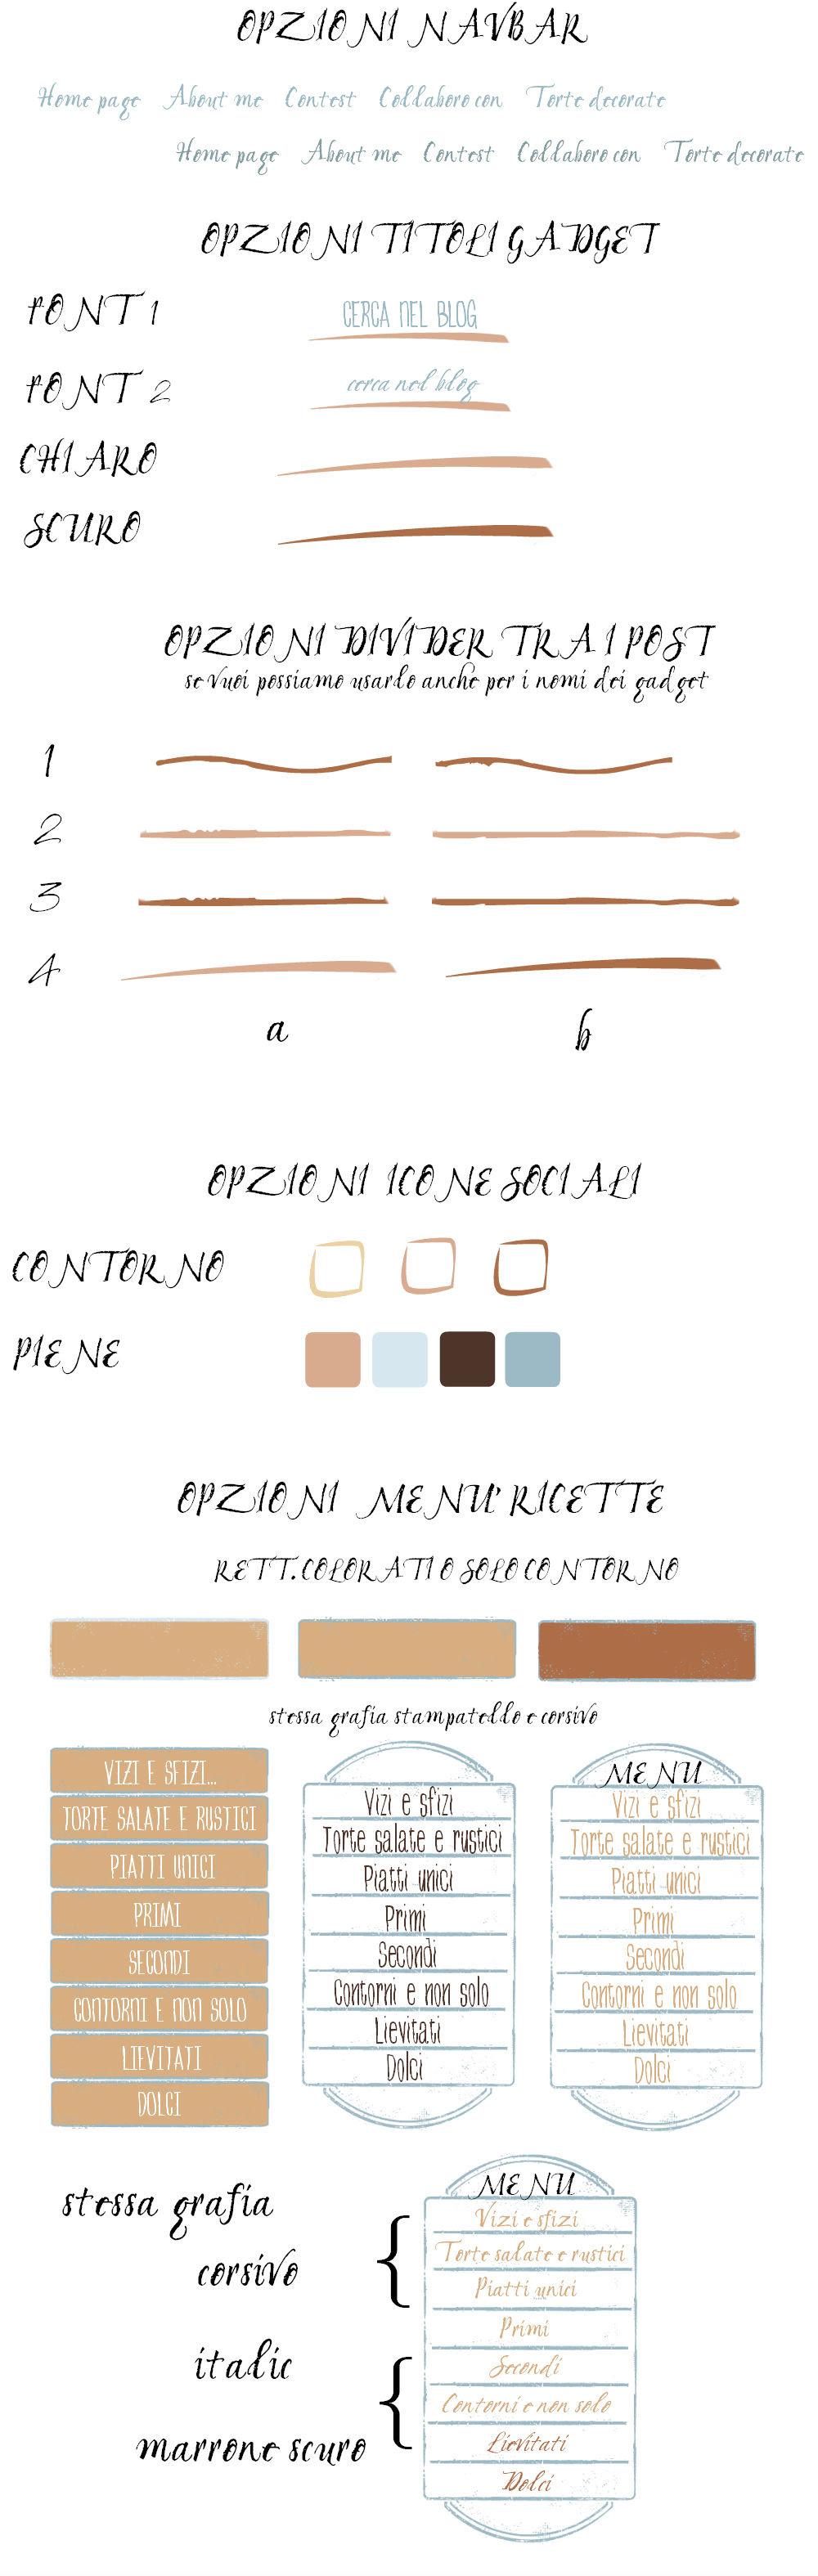 LARA INSPIRATION BOARD, blog design by alex bonetto